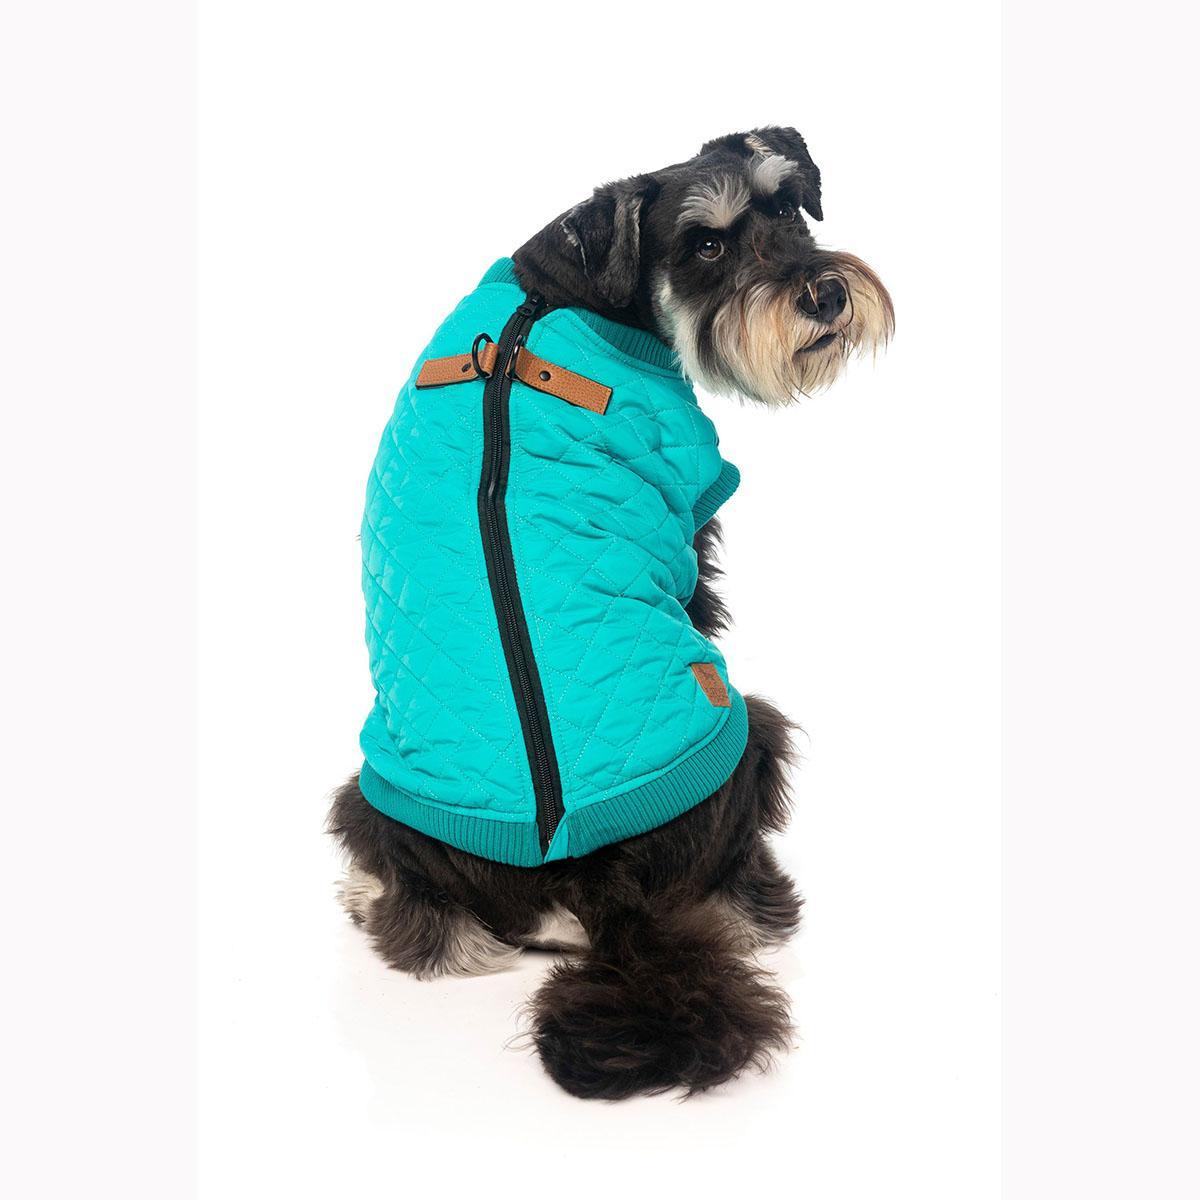 FuzzYard MacGyver Harness Jacket - Teal